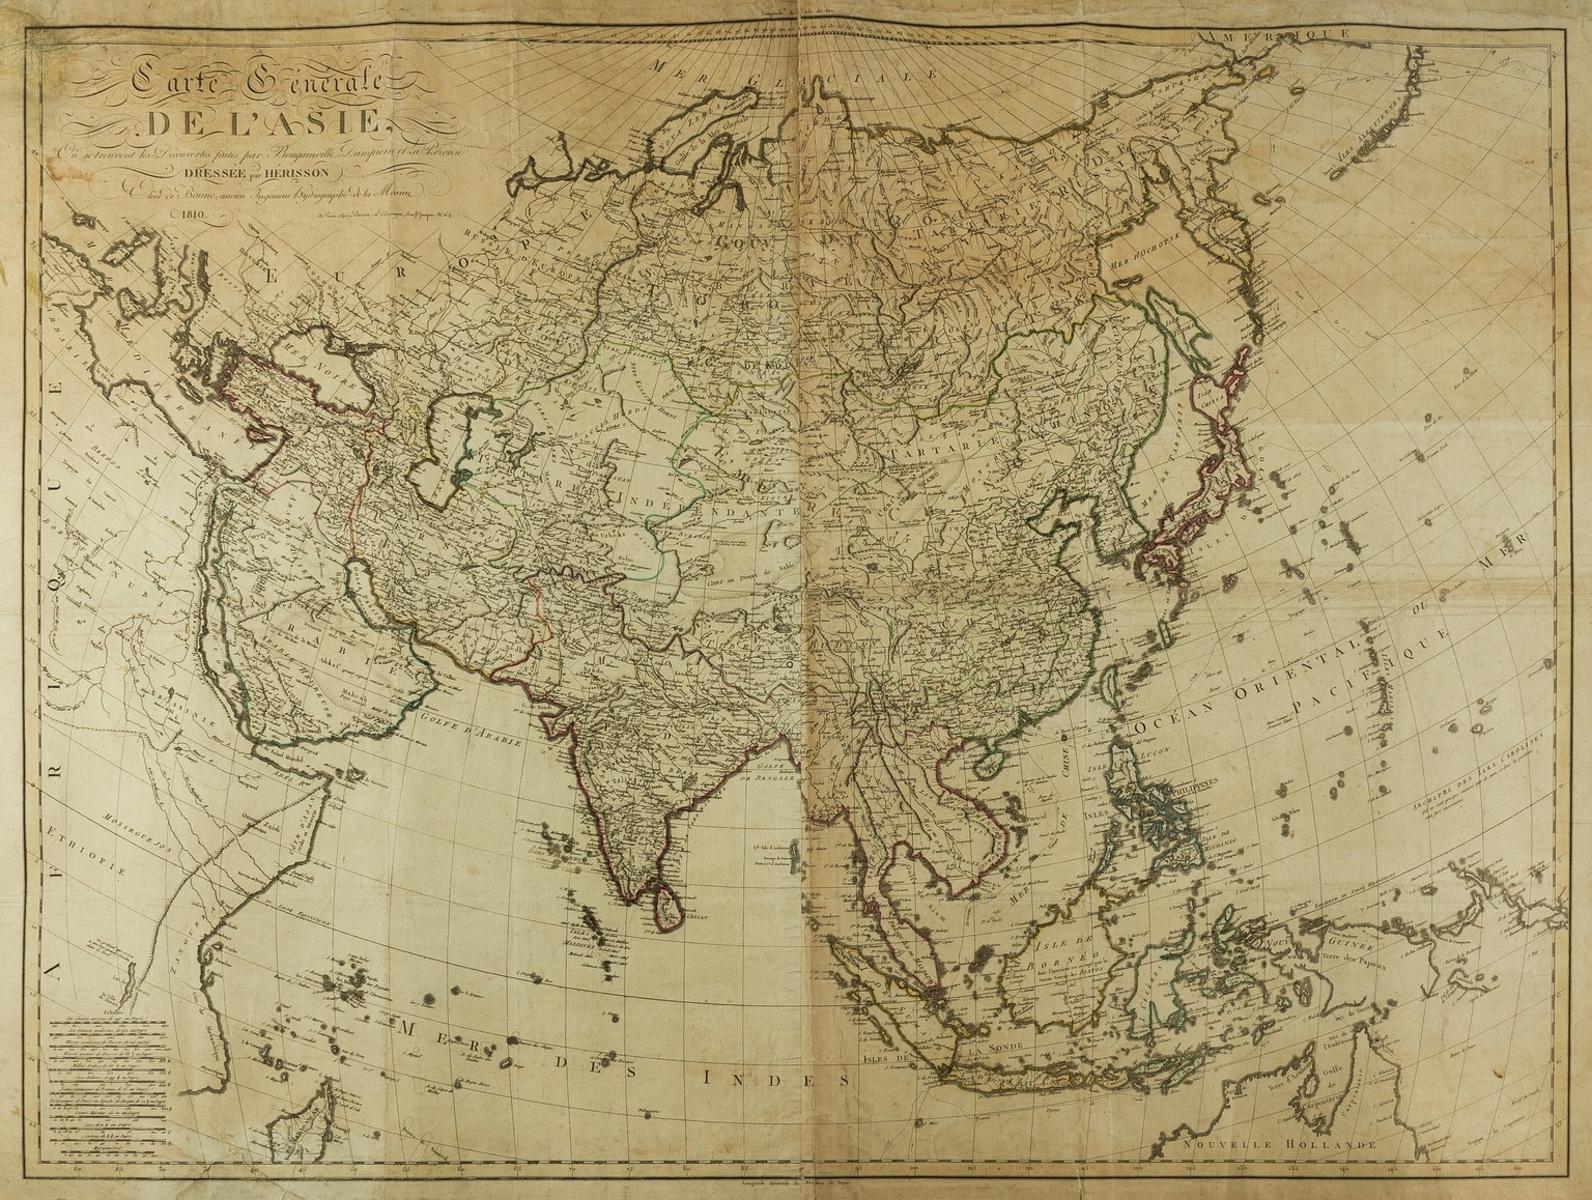 Asia.- Bonne (Rigobert) Carte Generale de l'Asie..., 1810.